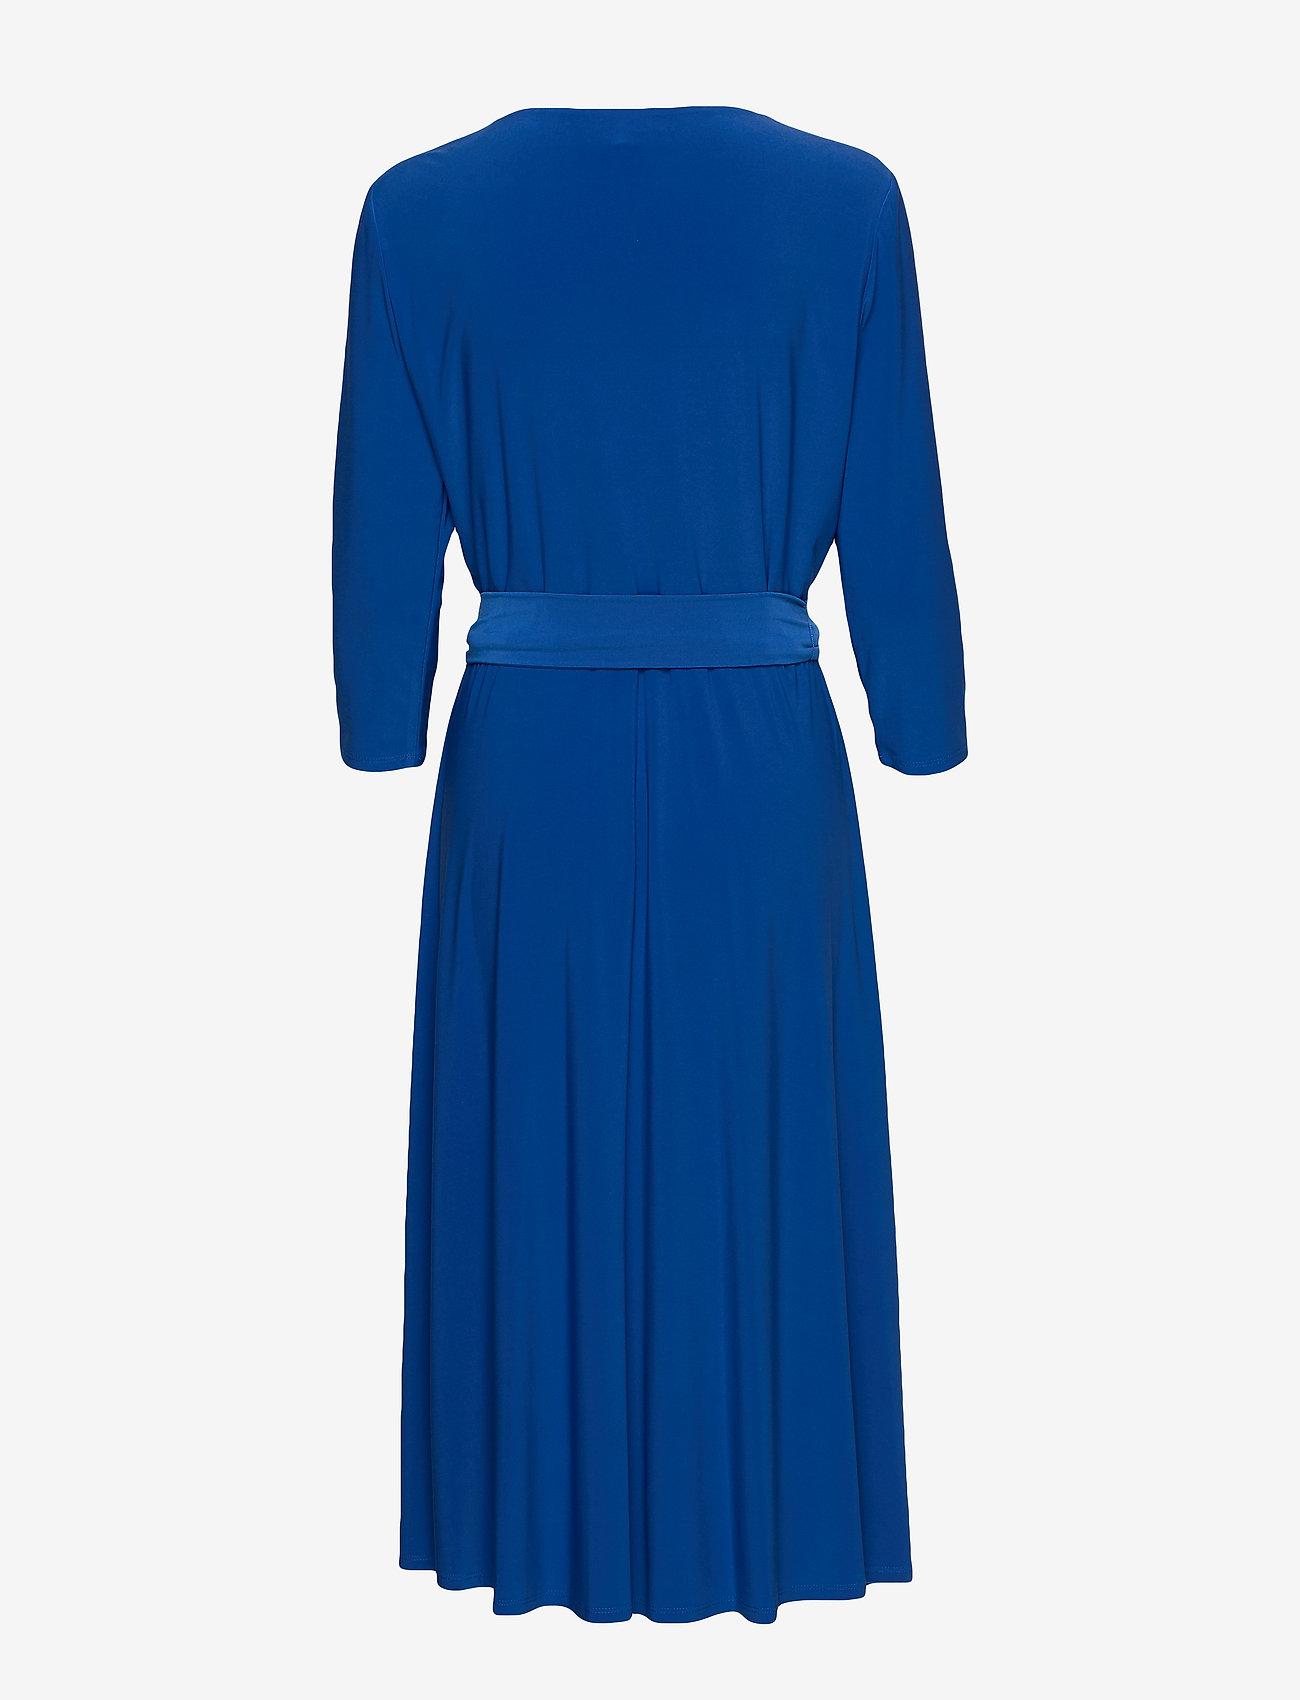 Surplice Jersey Dress (Regal Sapphire) - Lauren Ralph Lauren Q56vHp